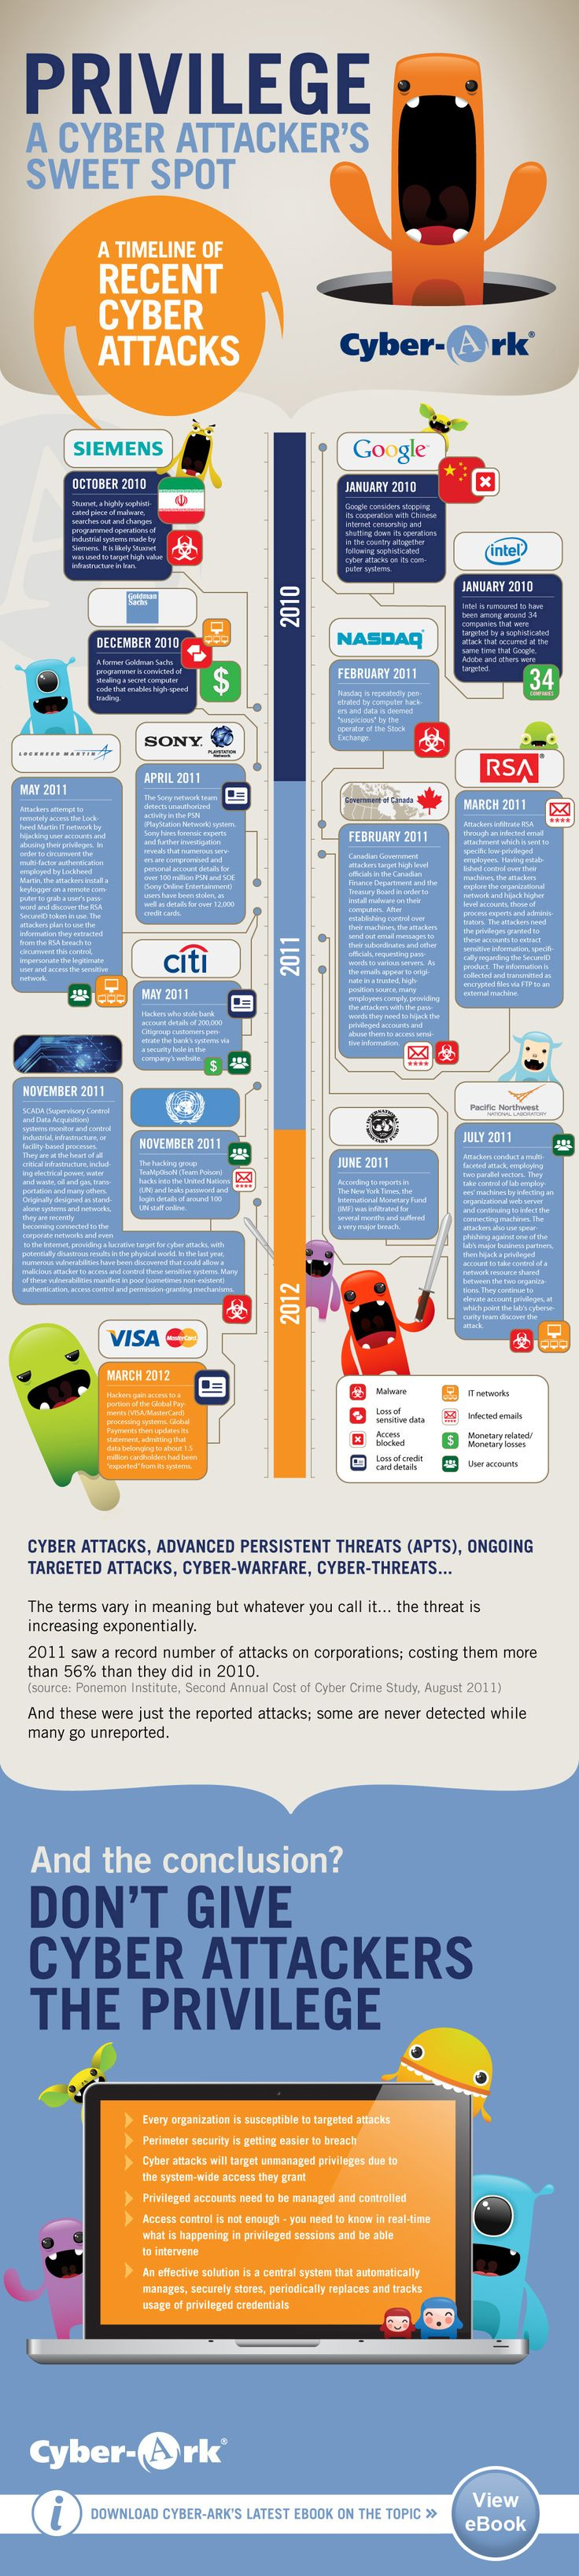 Timeline de ciberataques #infografia #infographic #internet